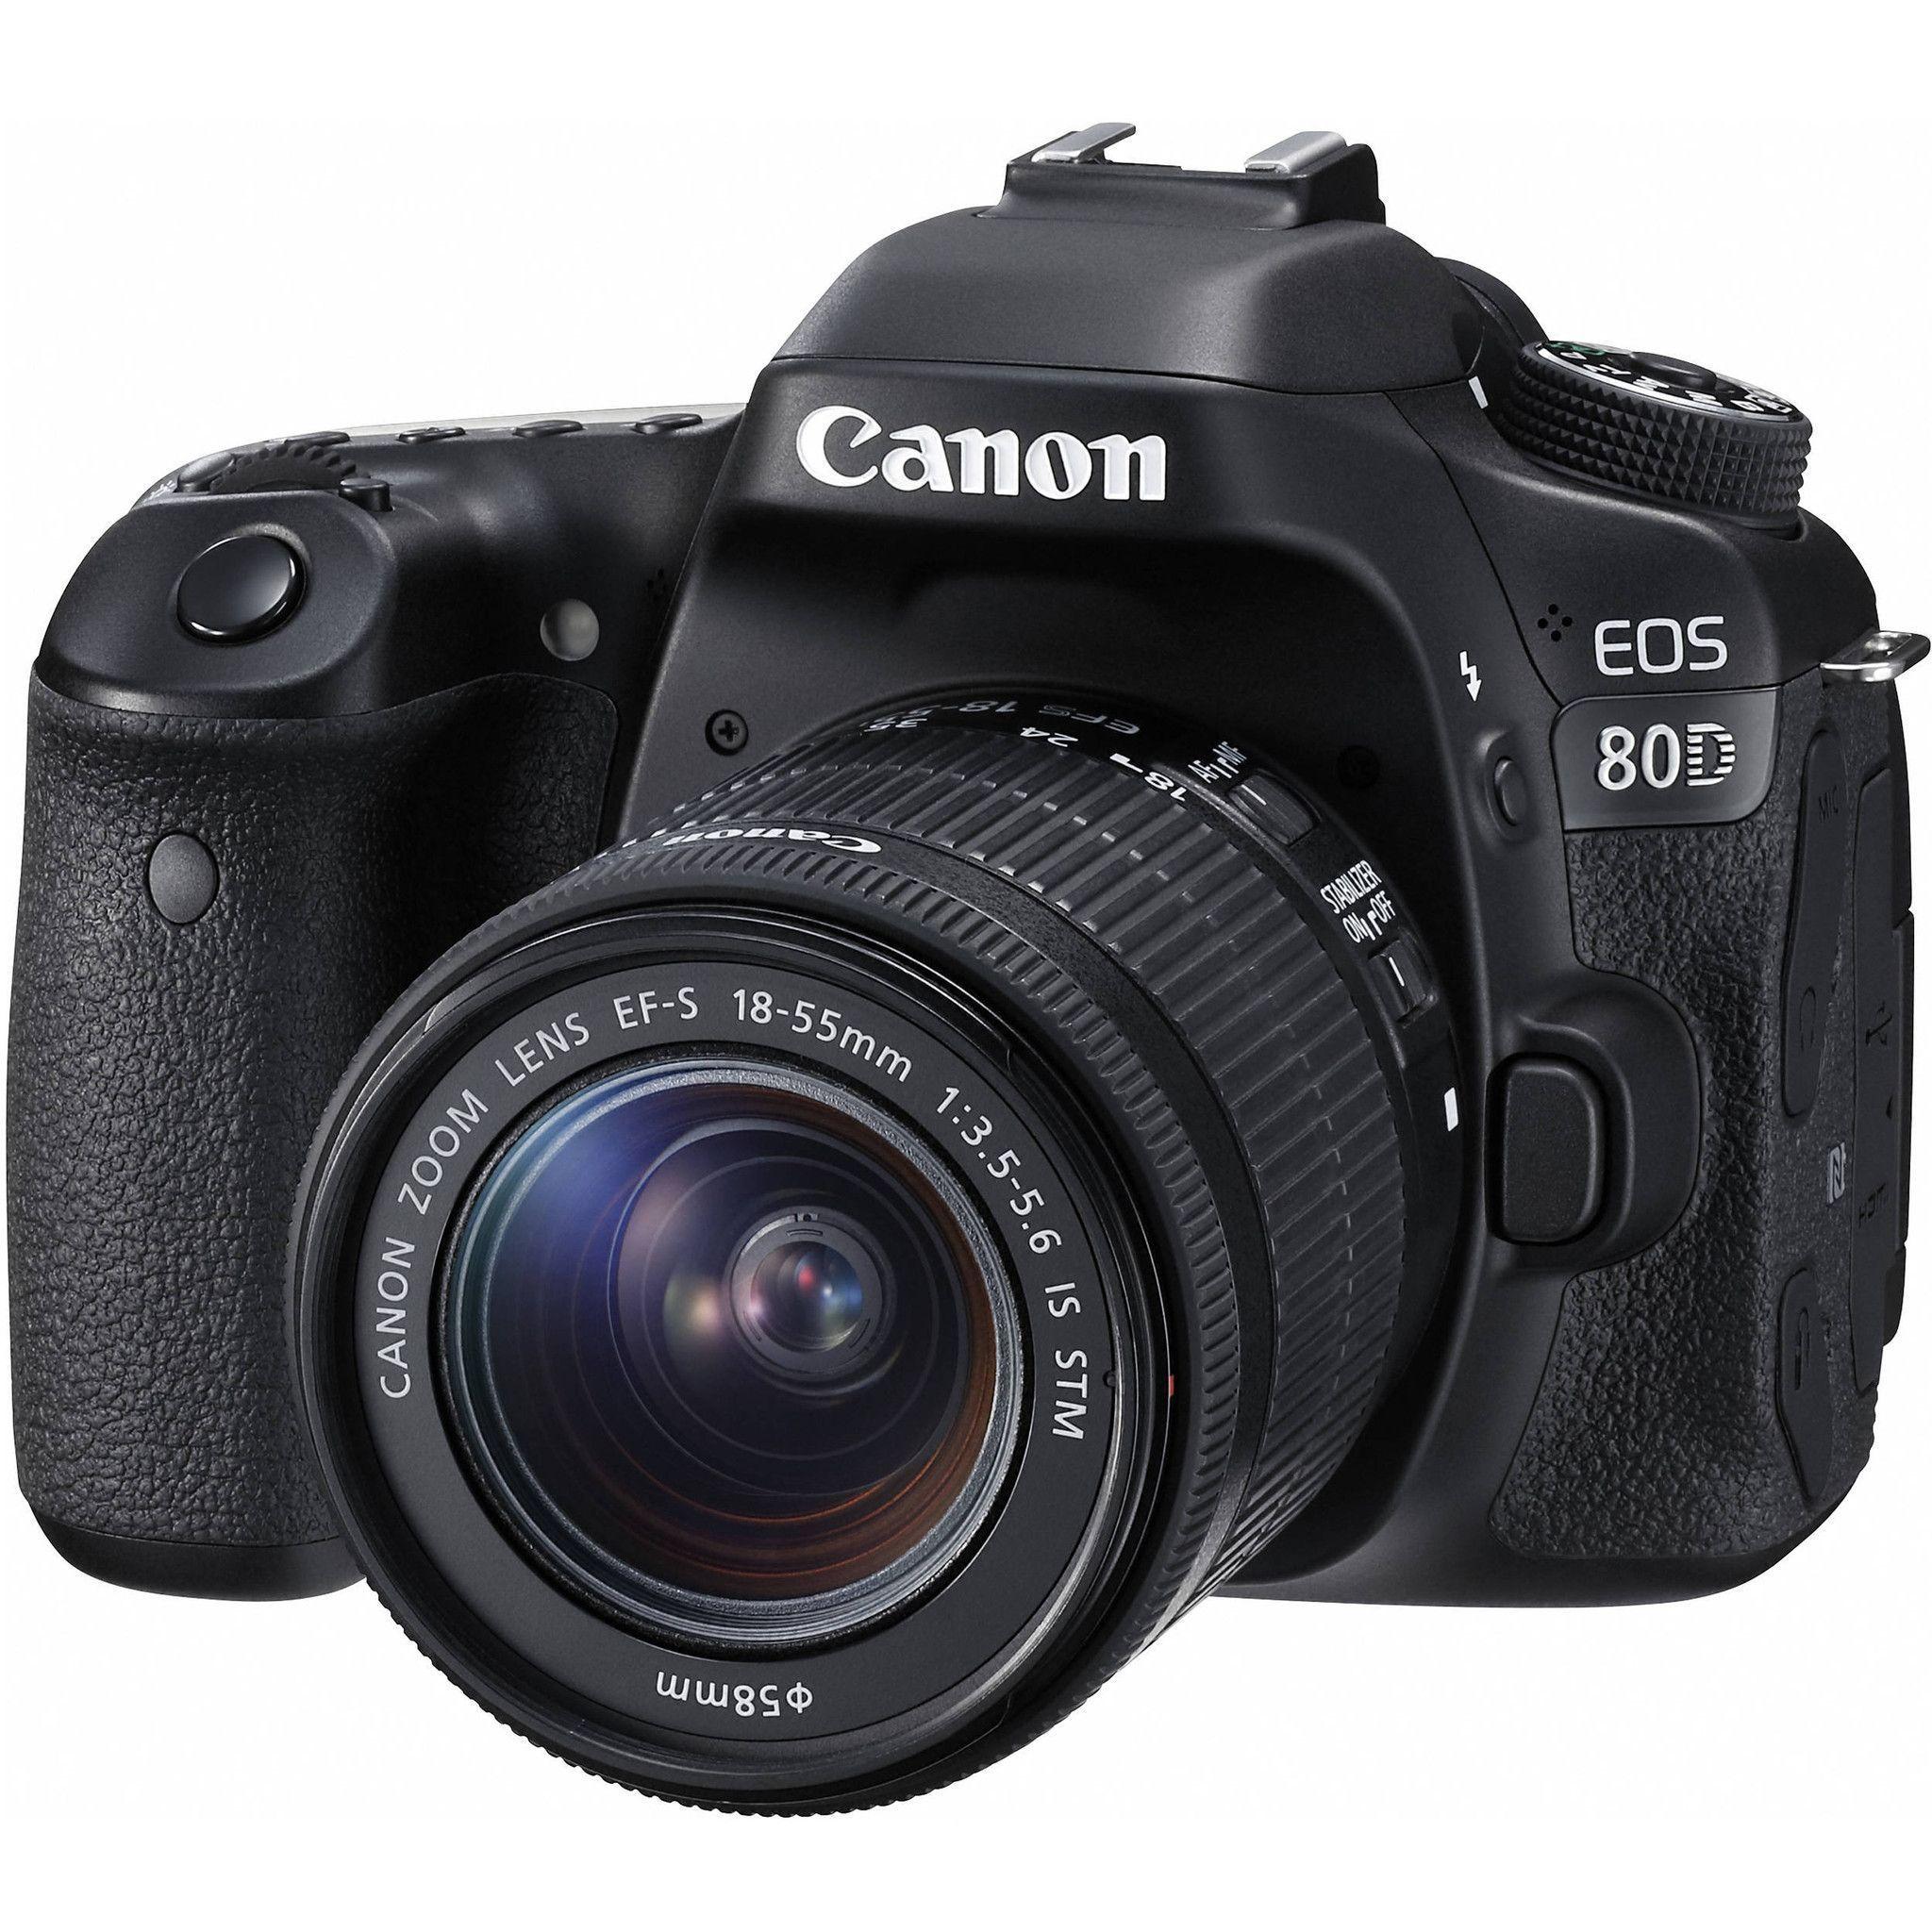 Canon Eos 80d Ef S 18 55mm Is Stm Kit 1263c005 Highlights 24 2mp Aps C Cmos Sensor Digic 6 Image Processor Canon Dslr Canon Camera Models Dslr Camera